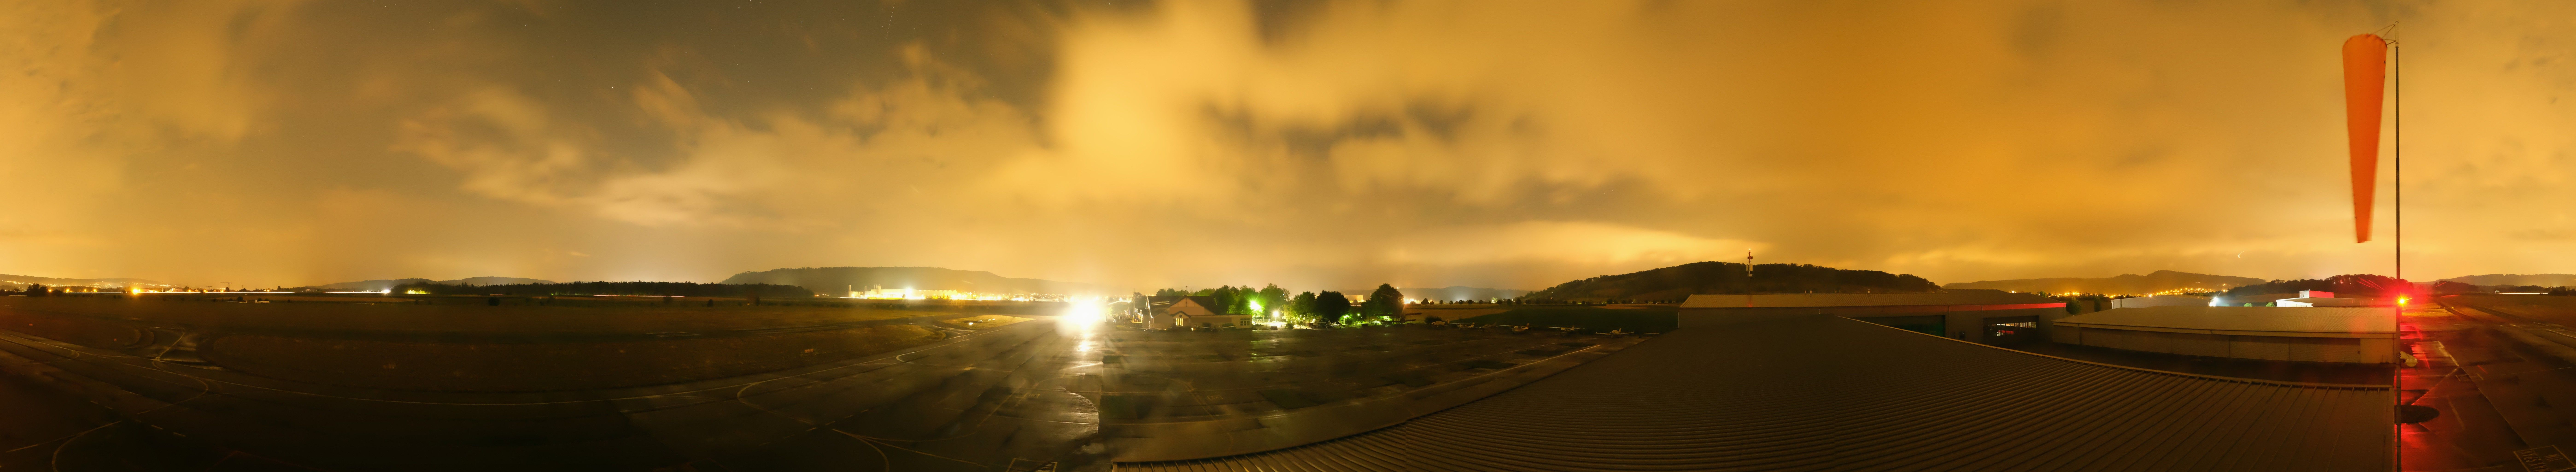 Lupfig: Flugplatz Birrfeld